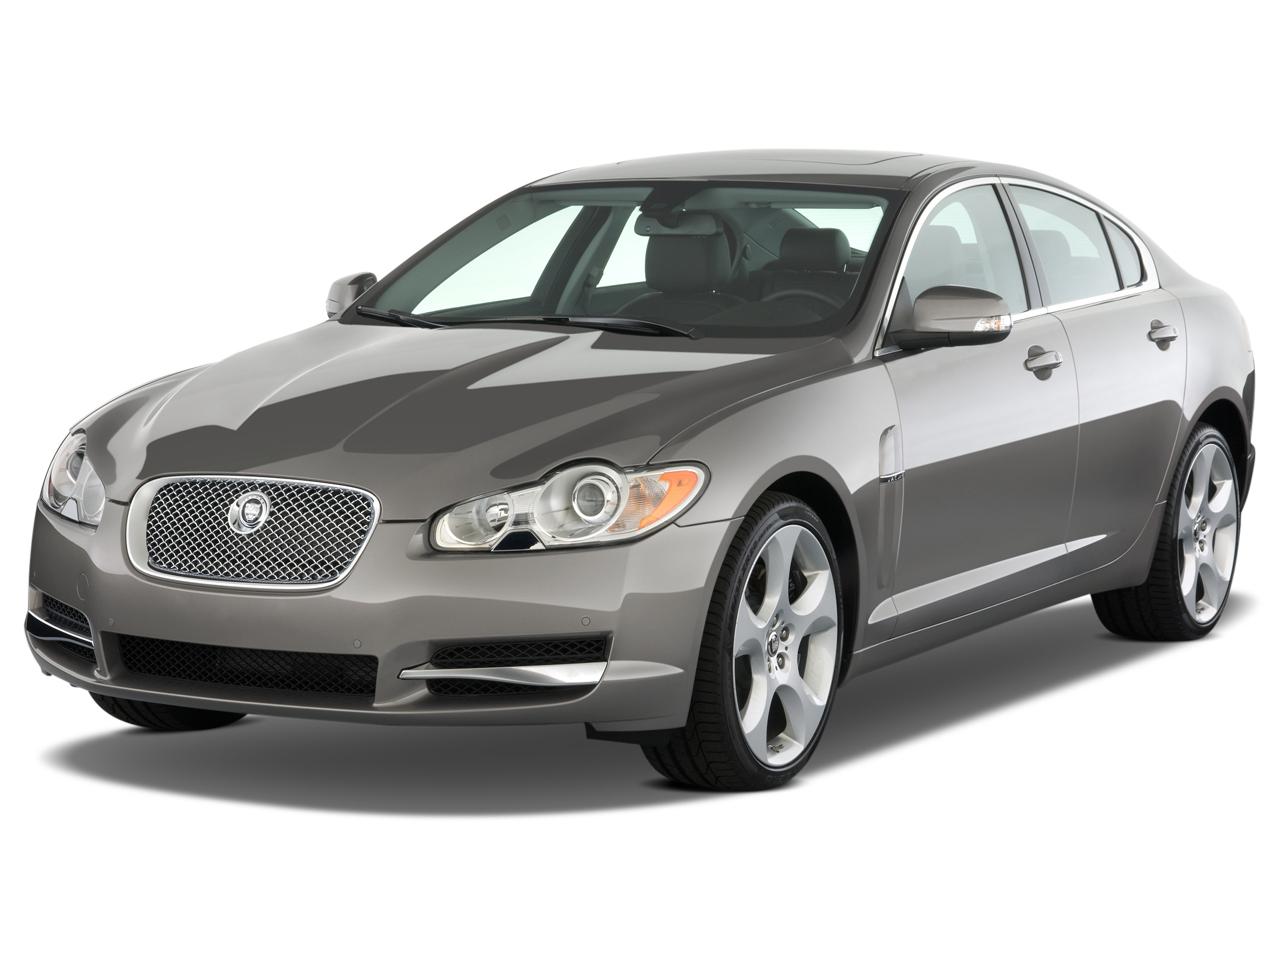 2011 Jaguar Xf Review And News Motorauthority